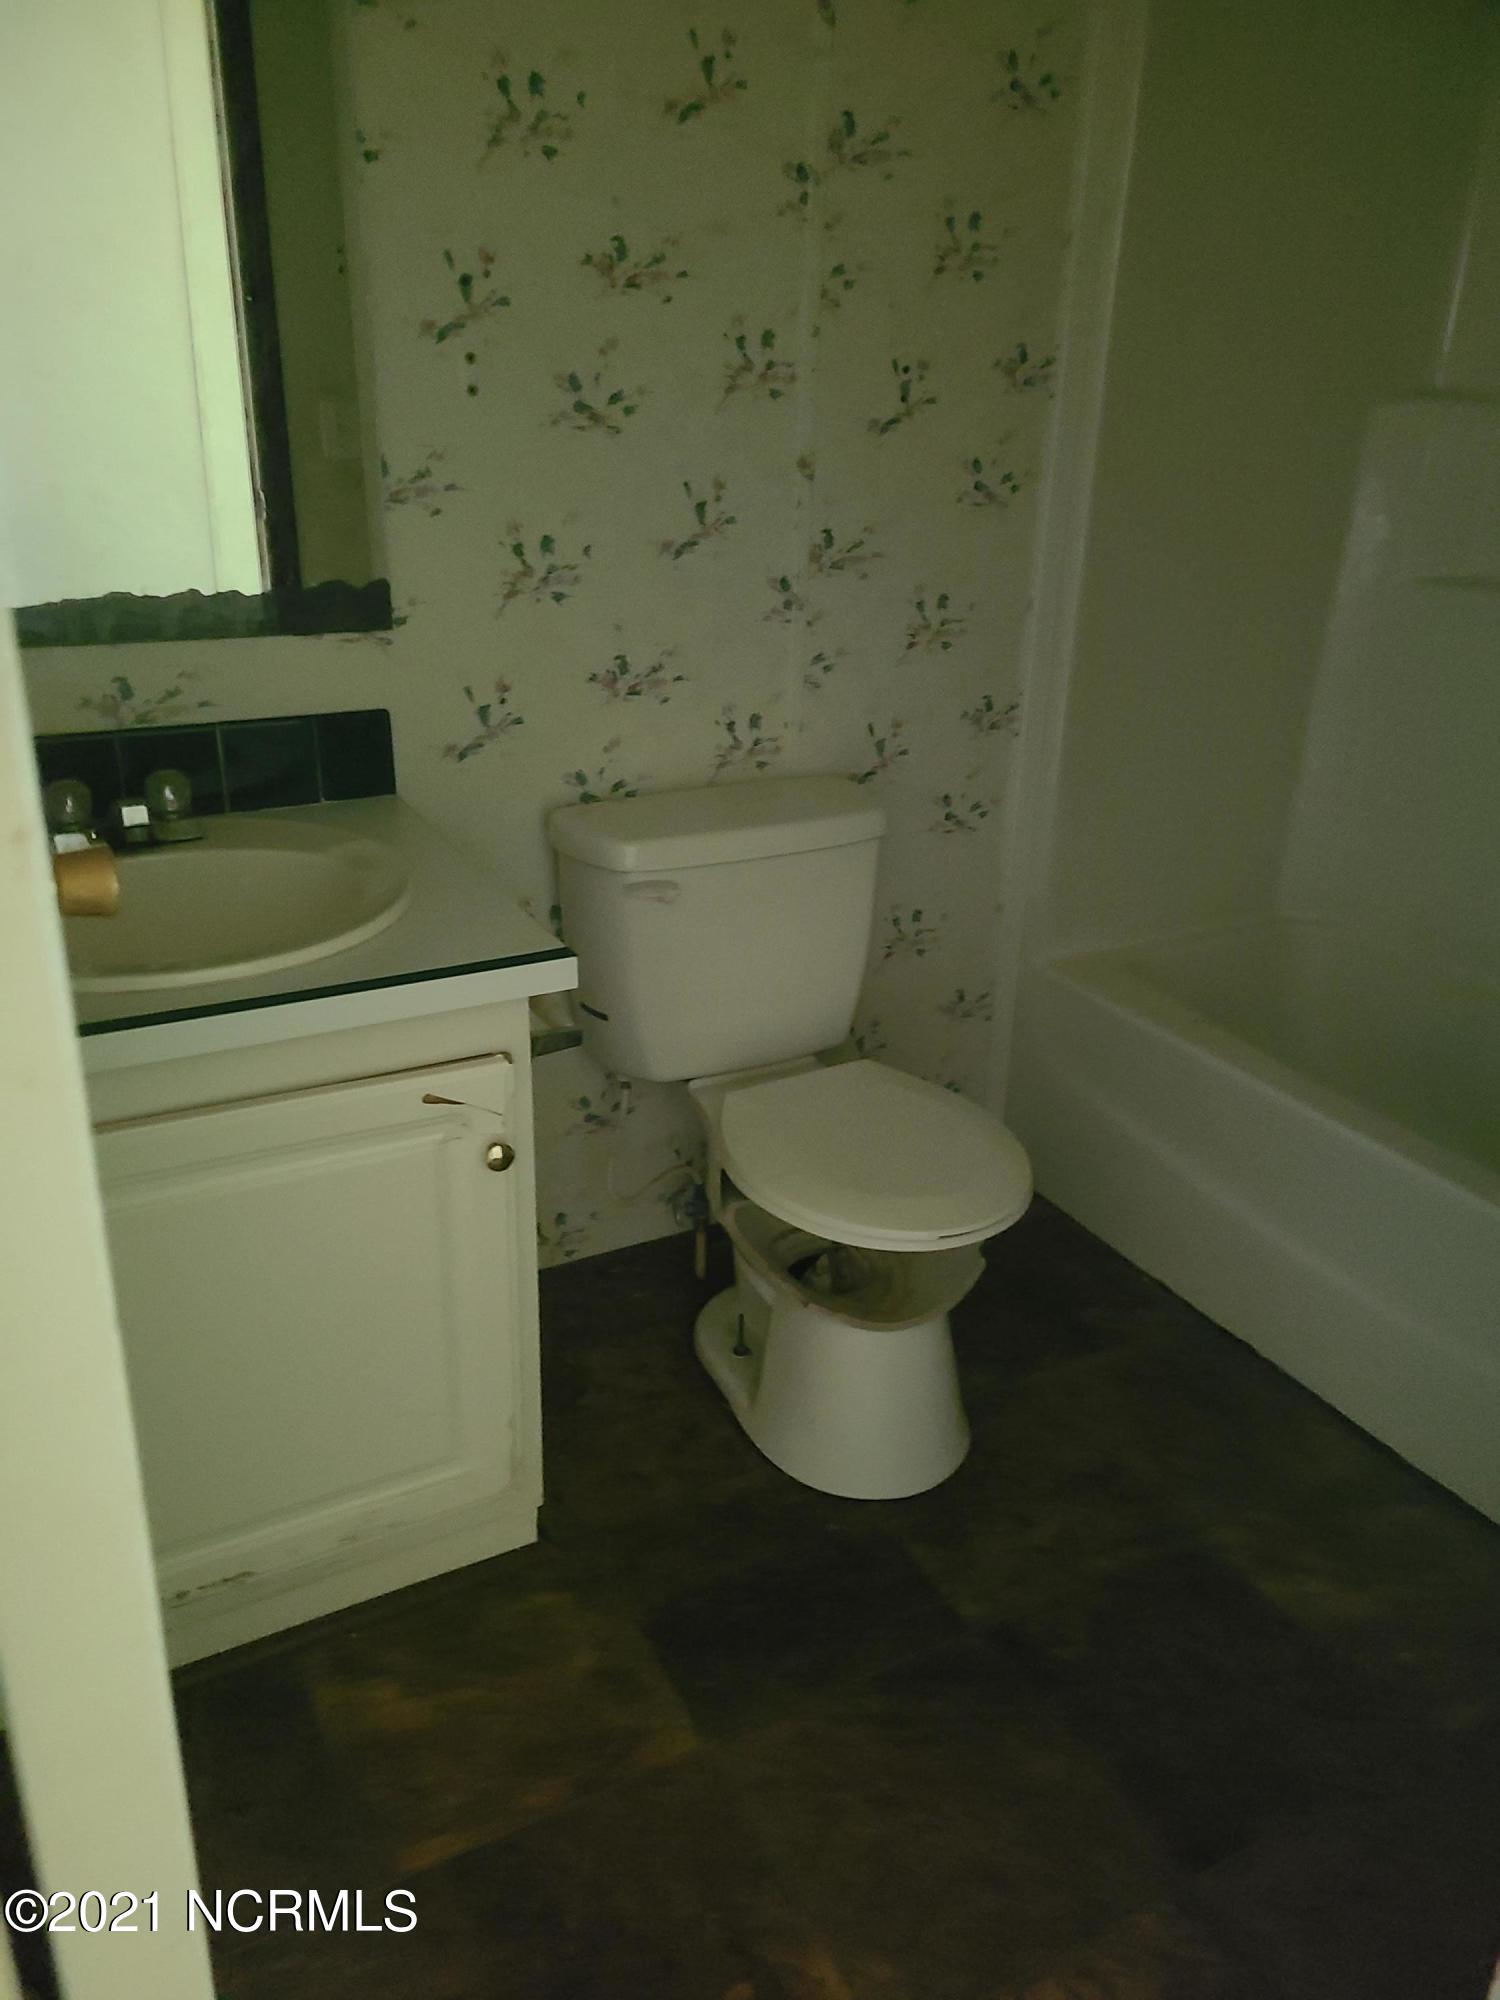 341 Burncoat Road, Kinston, North Carolina 28504, 7 Rooms Rooms,3 BathroomsBathrooms,Manufactured home,For sale,Burncoat,100285117